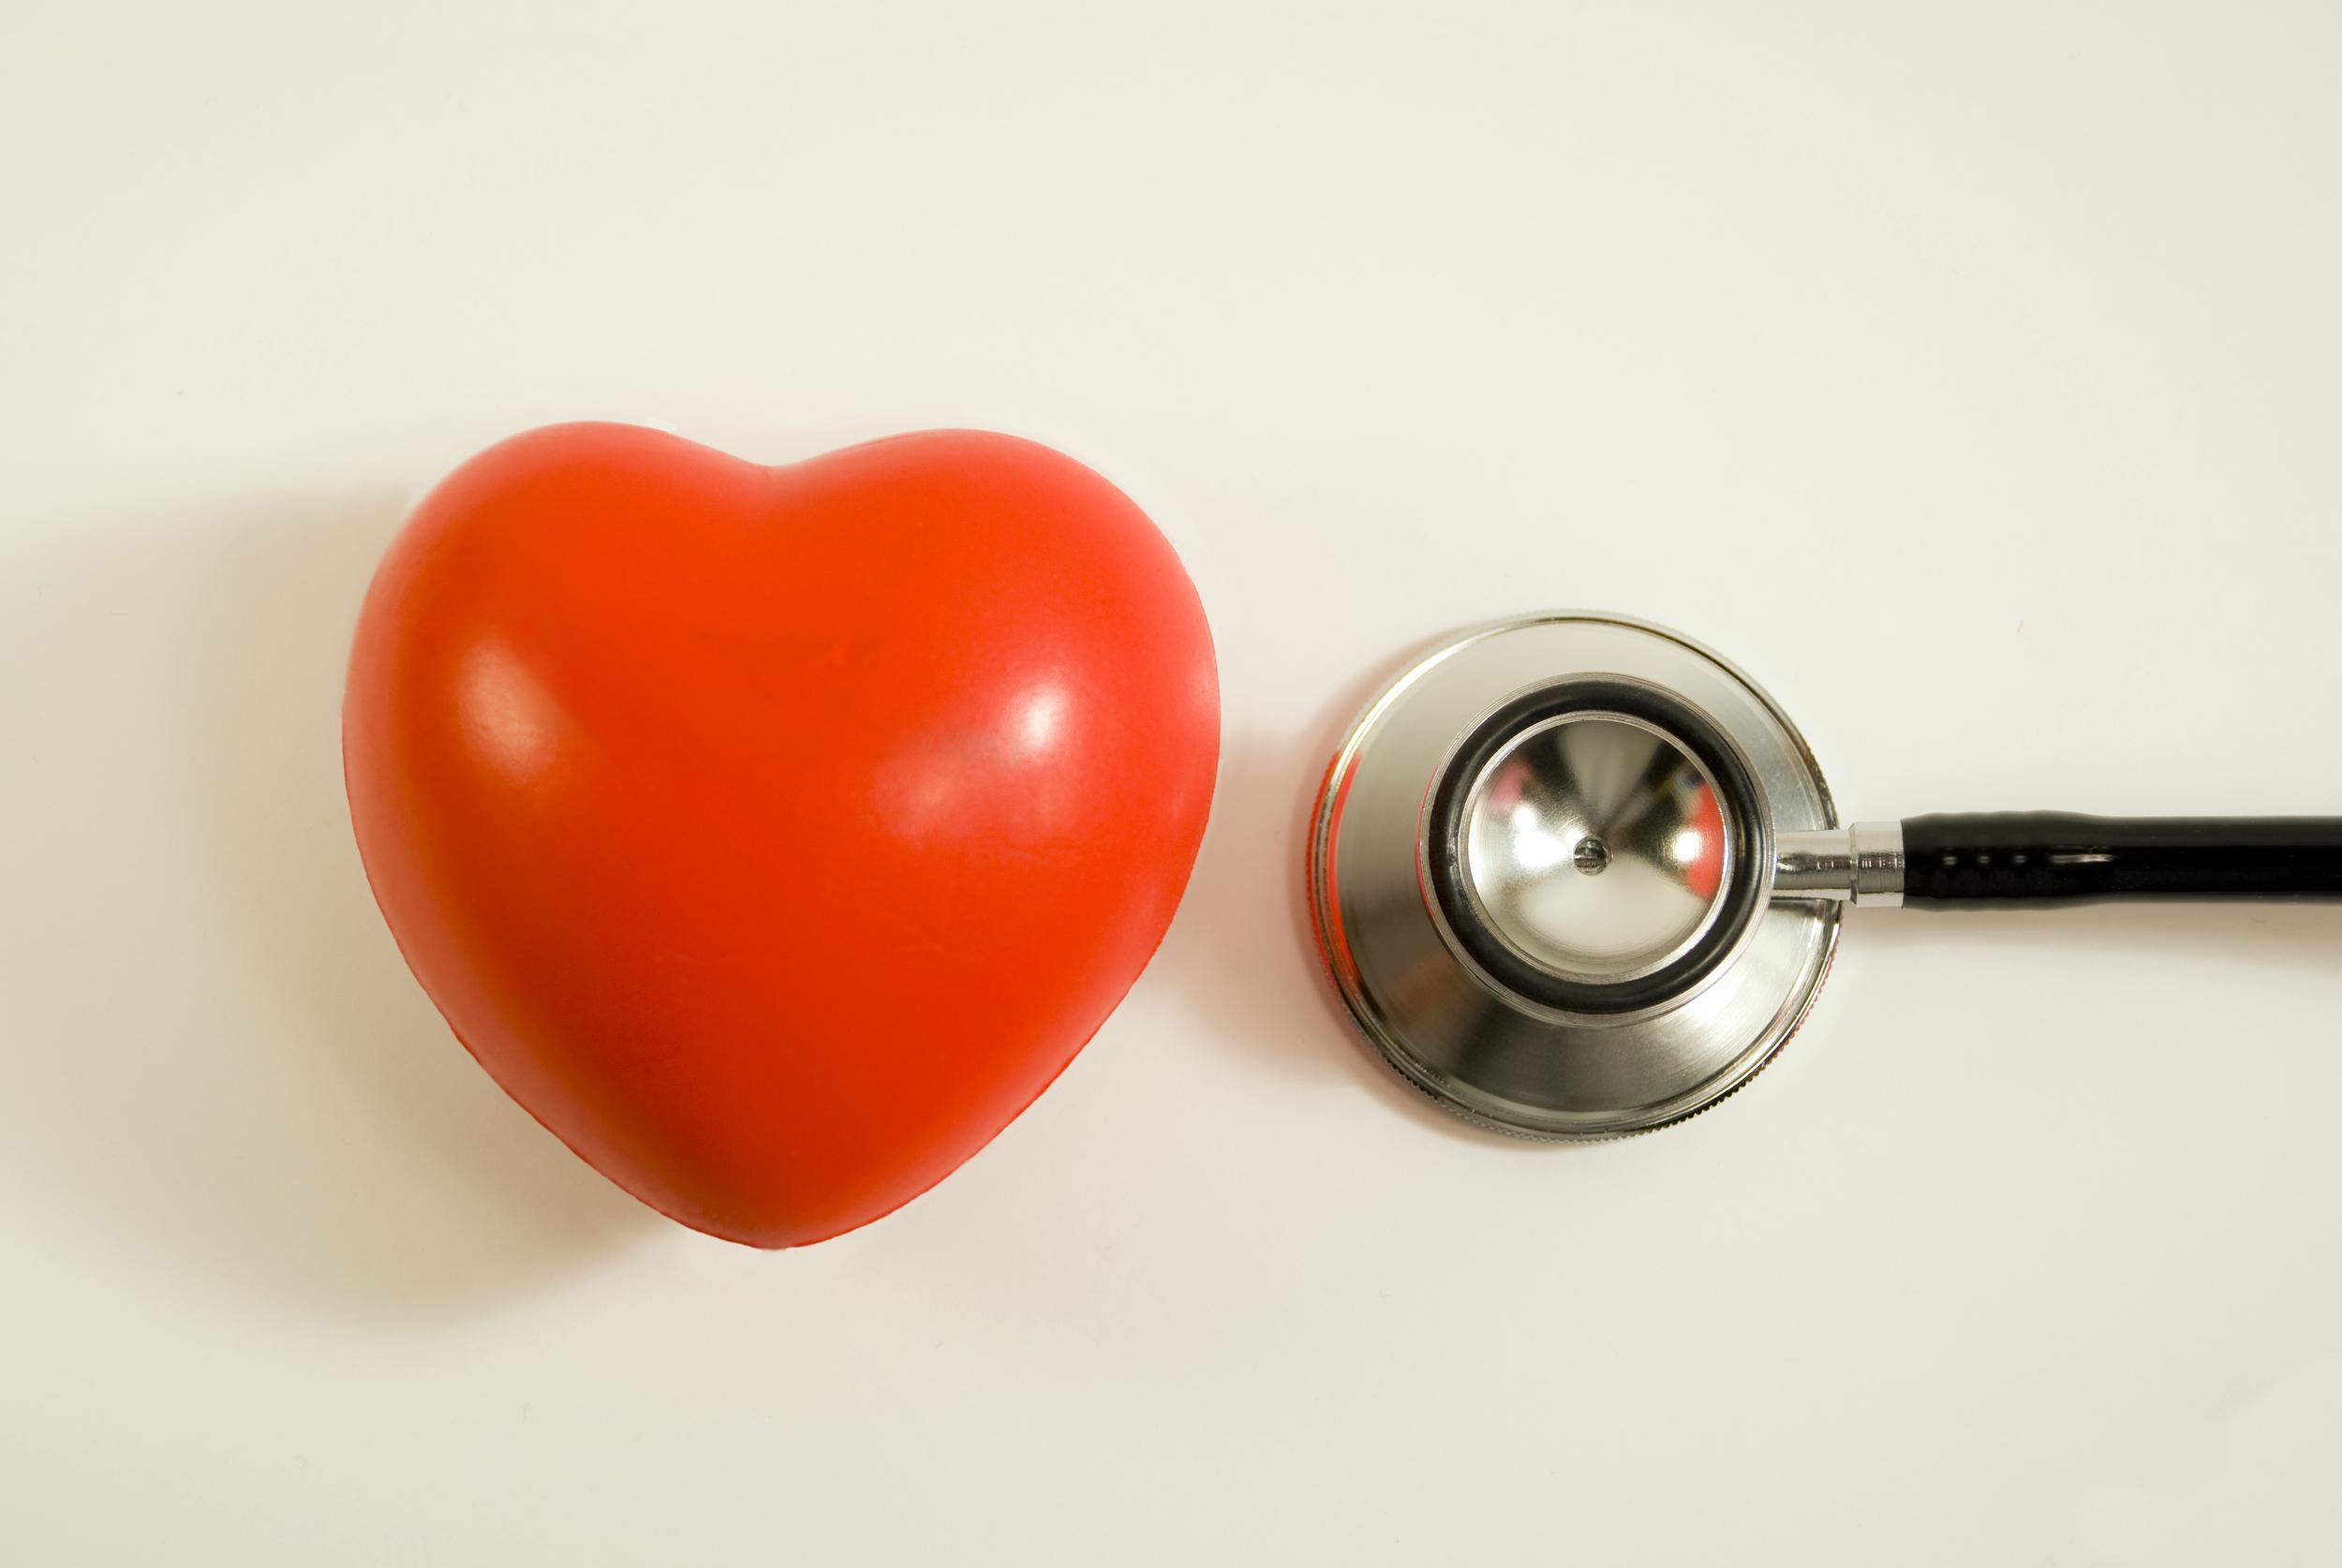 heart next to scope.jpg